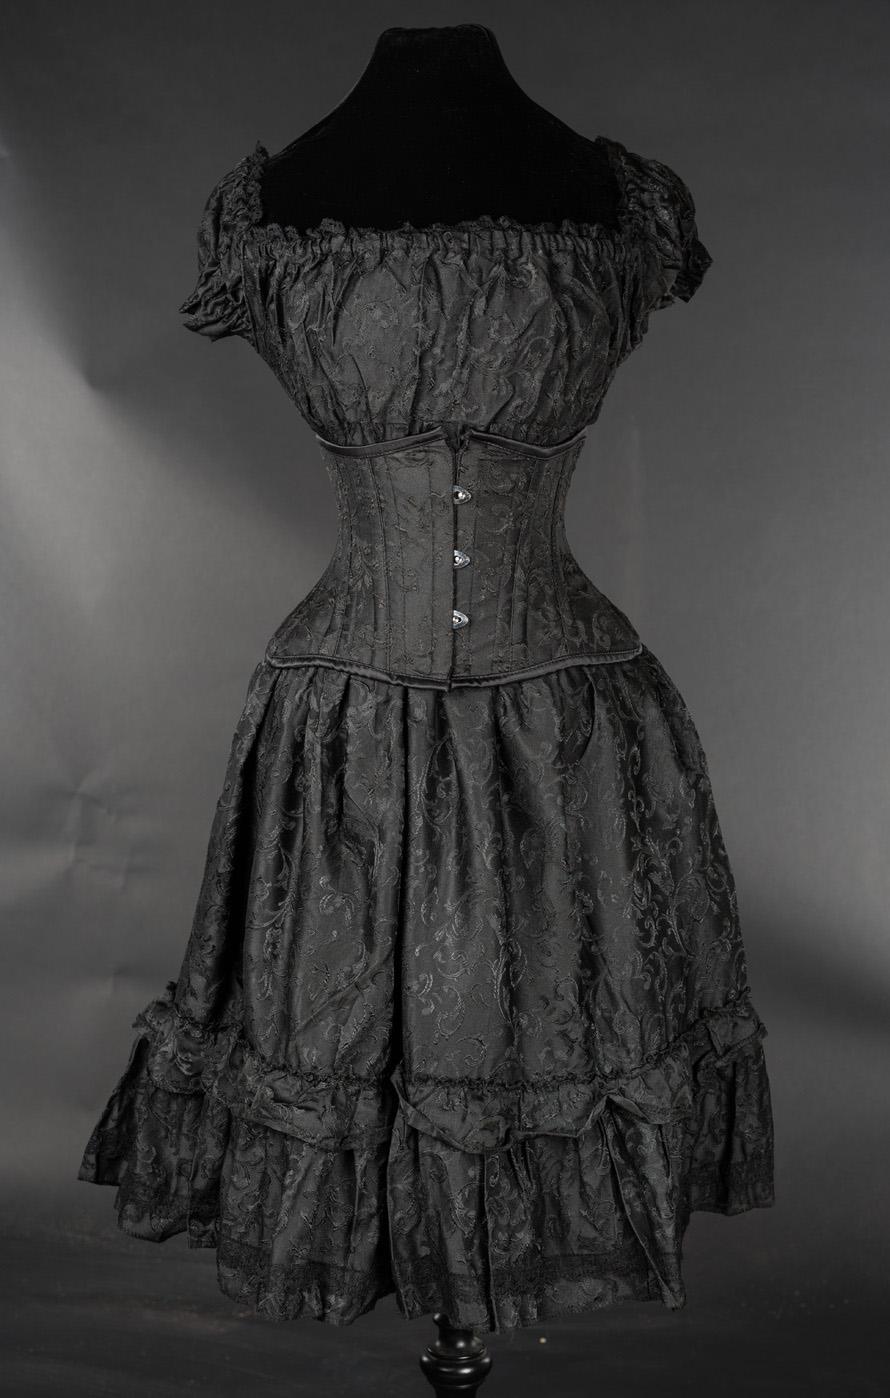 rebelsmarket_black_brocade_gothic_rockabilly_ruffle_corset_dress_6_to_ship_worldwide_dresses_2.jpg